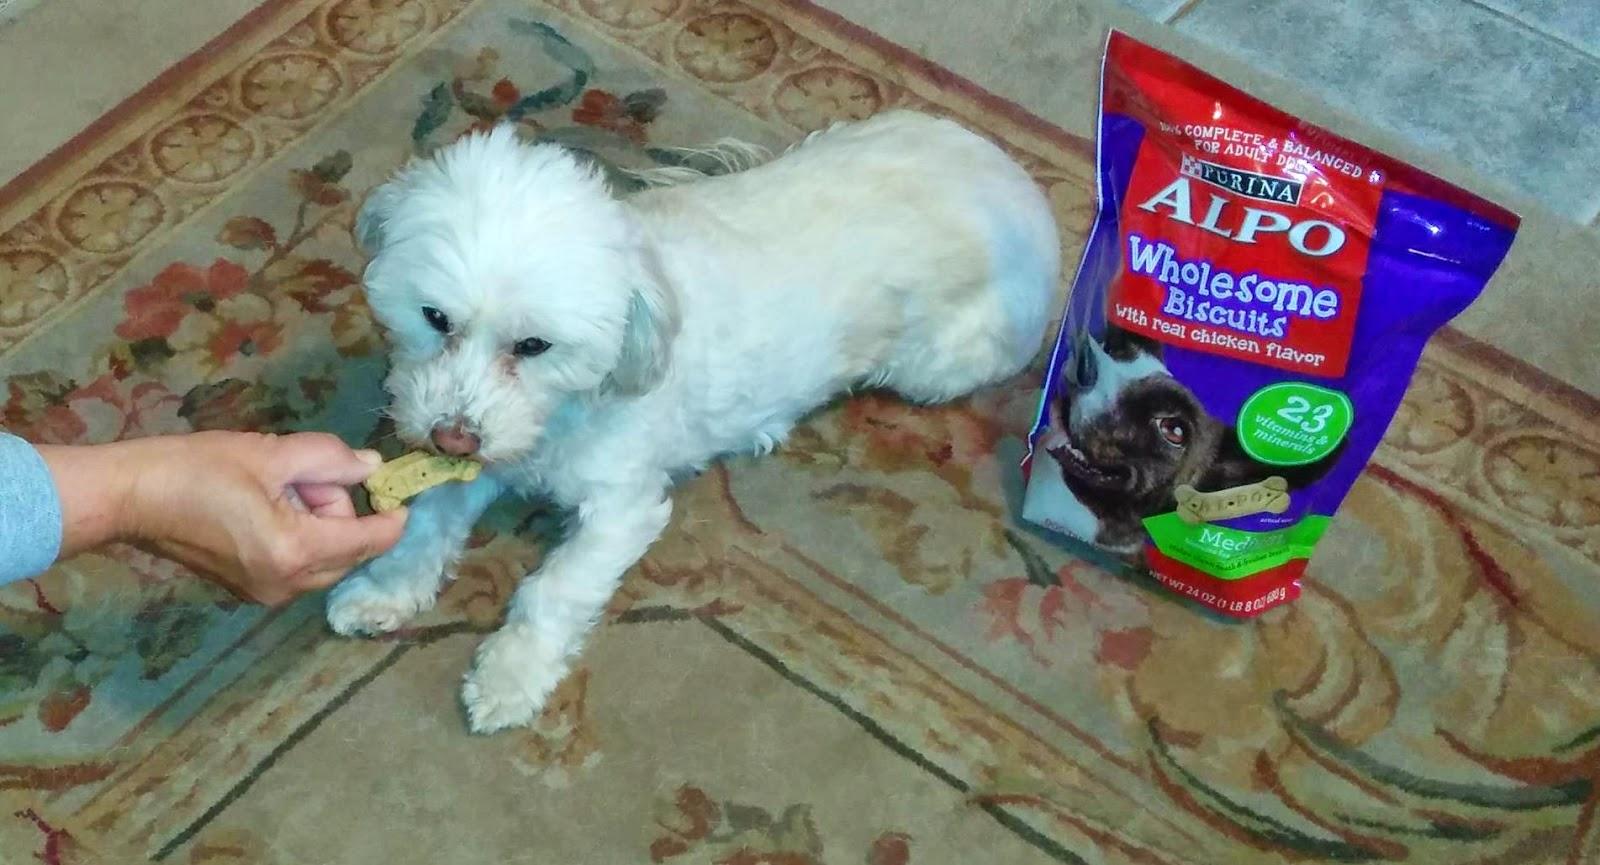 Alpo Dog Food Recall